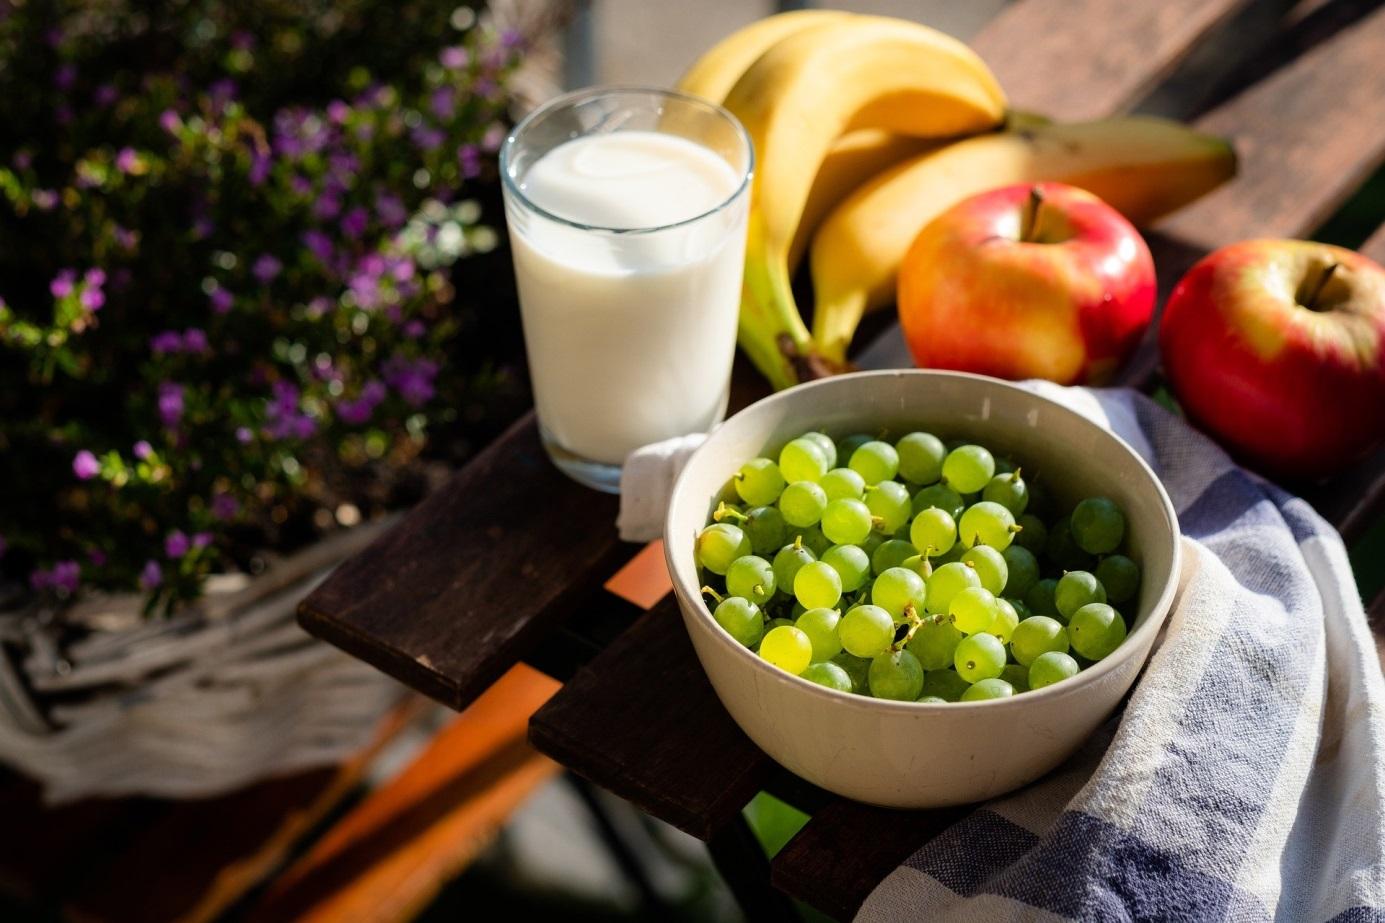 na stole stoją winogrona, jabłko i banany a obok szklanka mleka